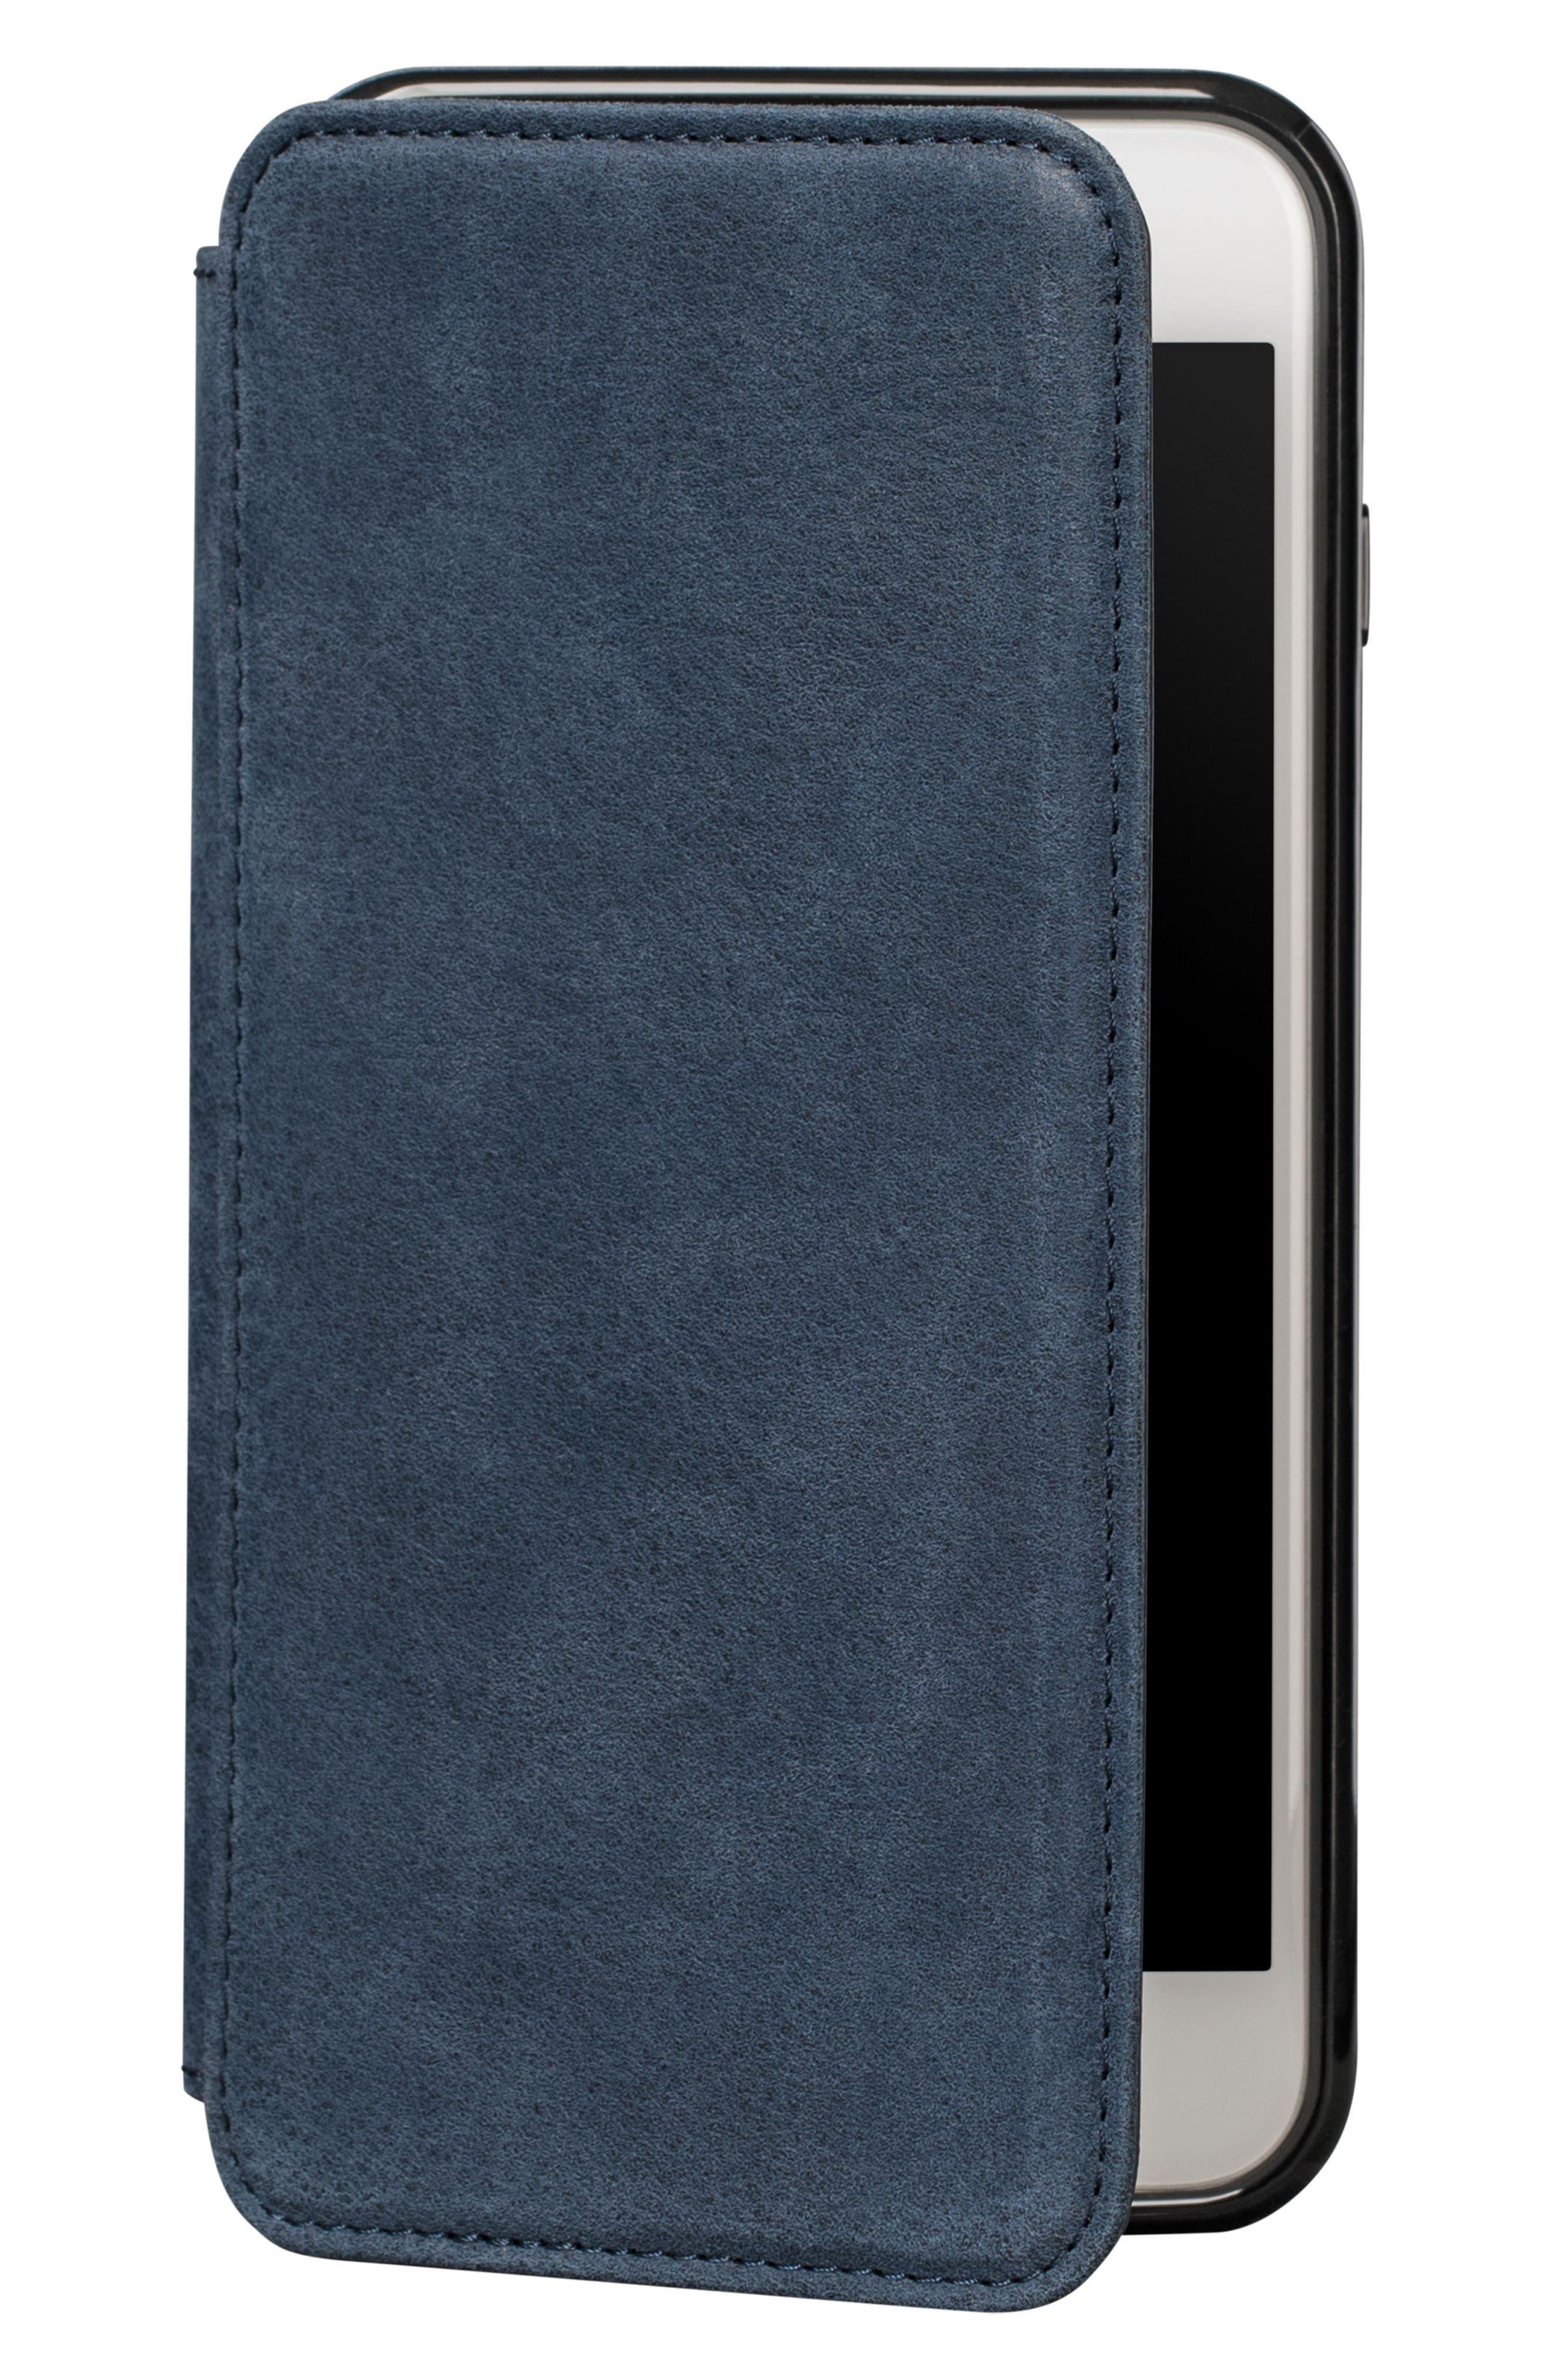 Bence iPhone 7/8 Plus Walletbook,                         Main,                         color, Denim